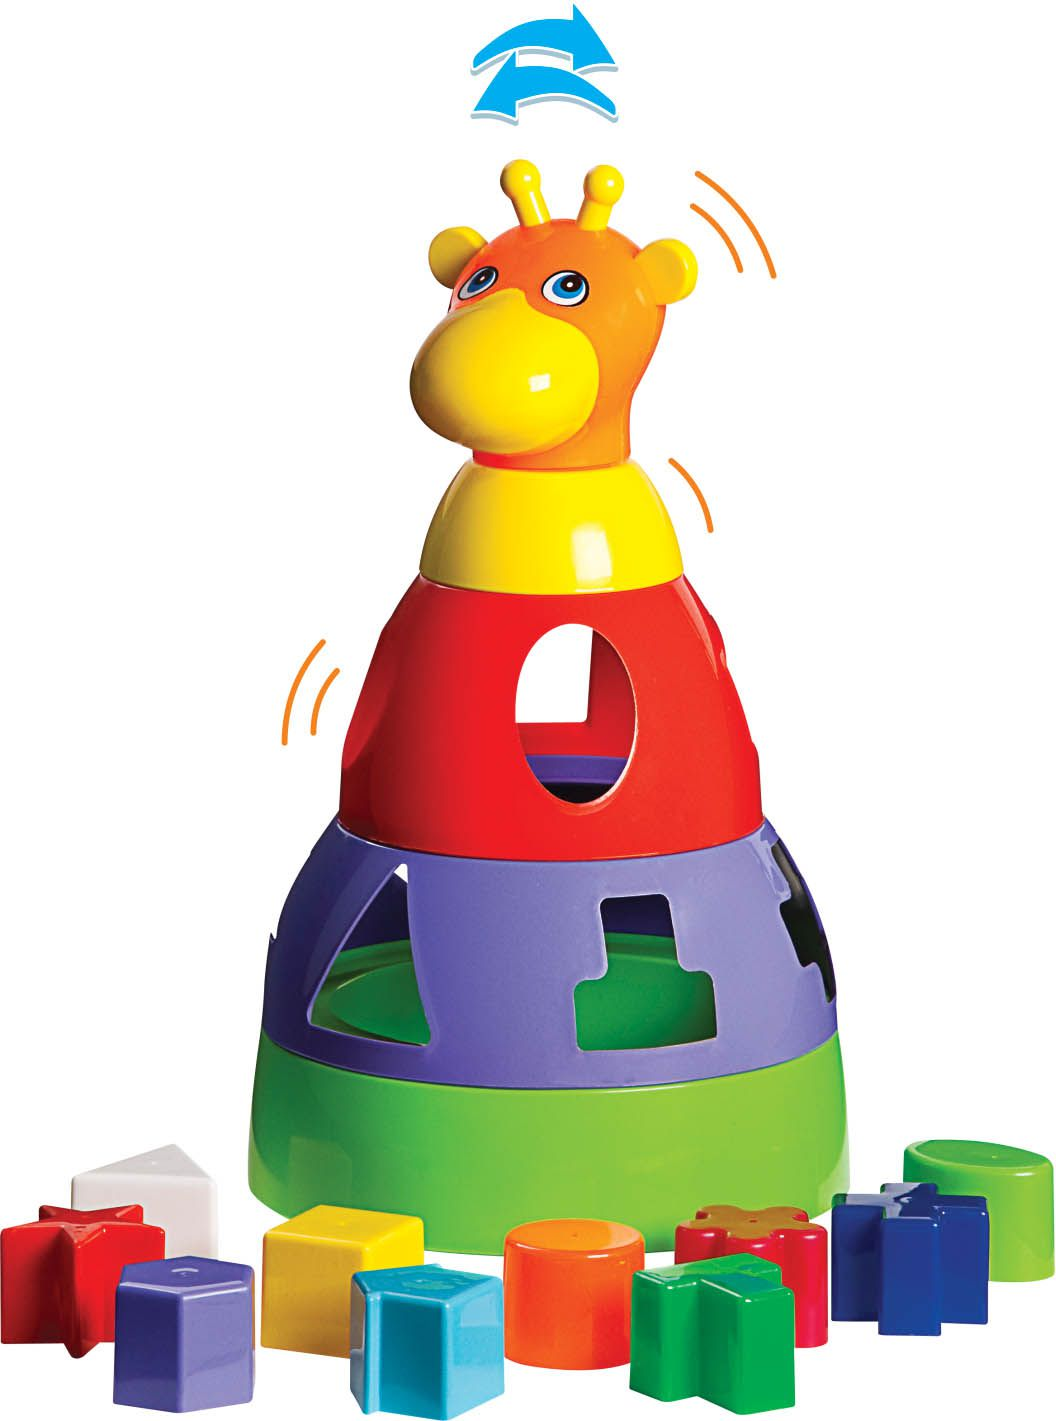 Kit de Brinquedos Educativos Girafa + Cubo + Bola